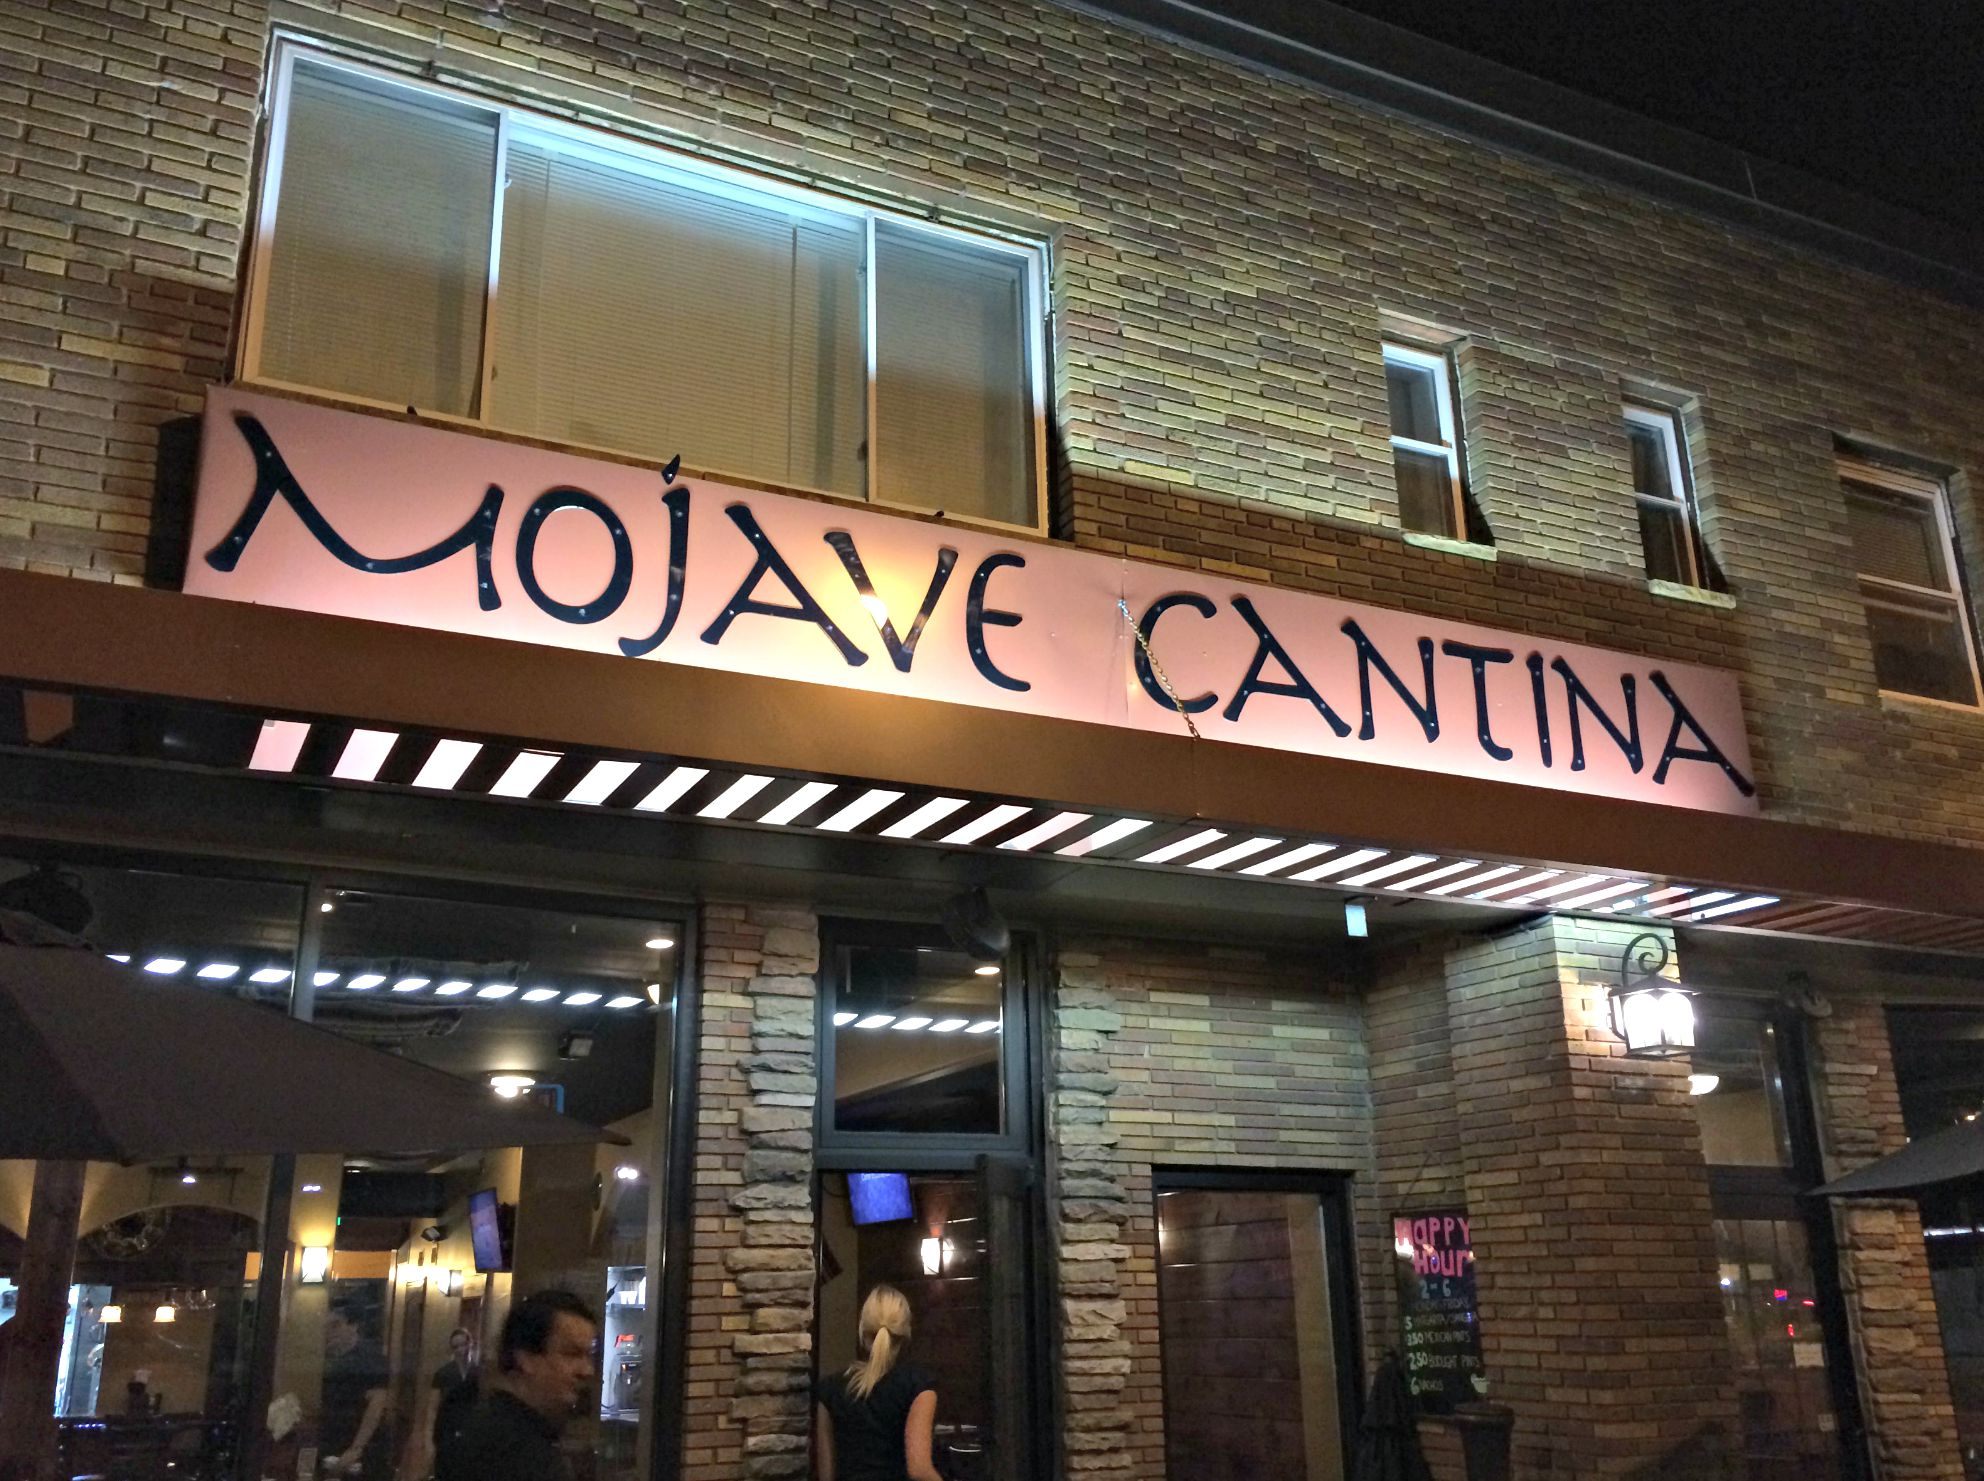 Mojave Cantina